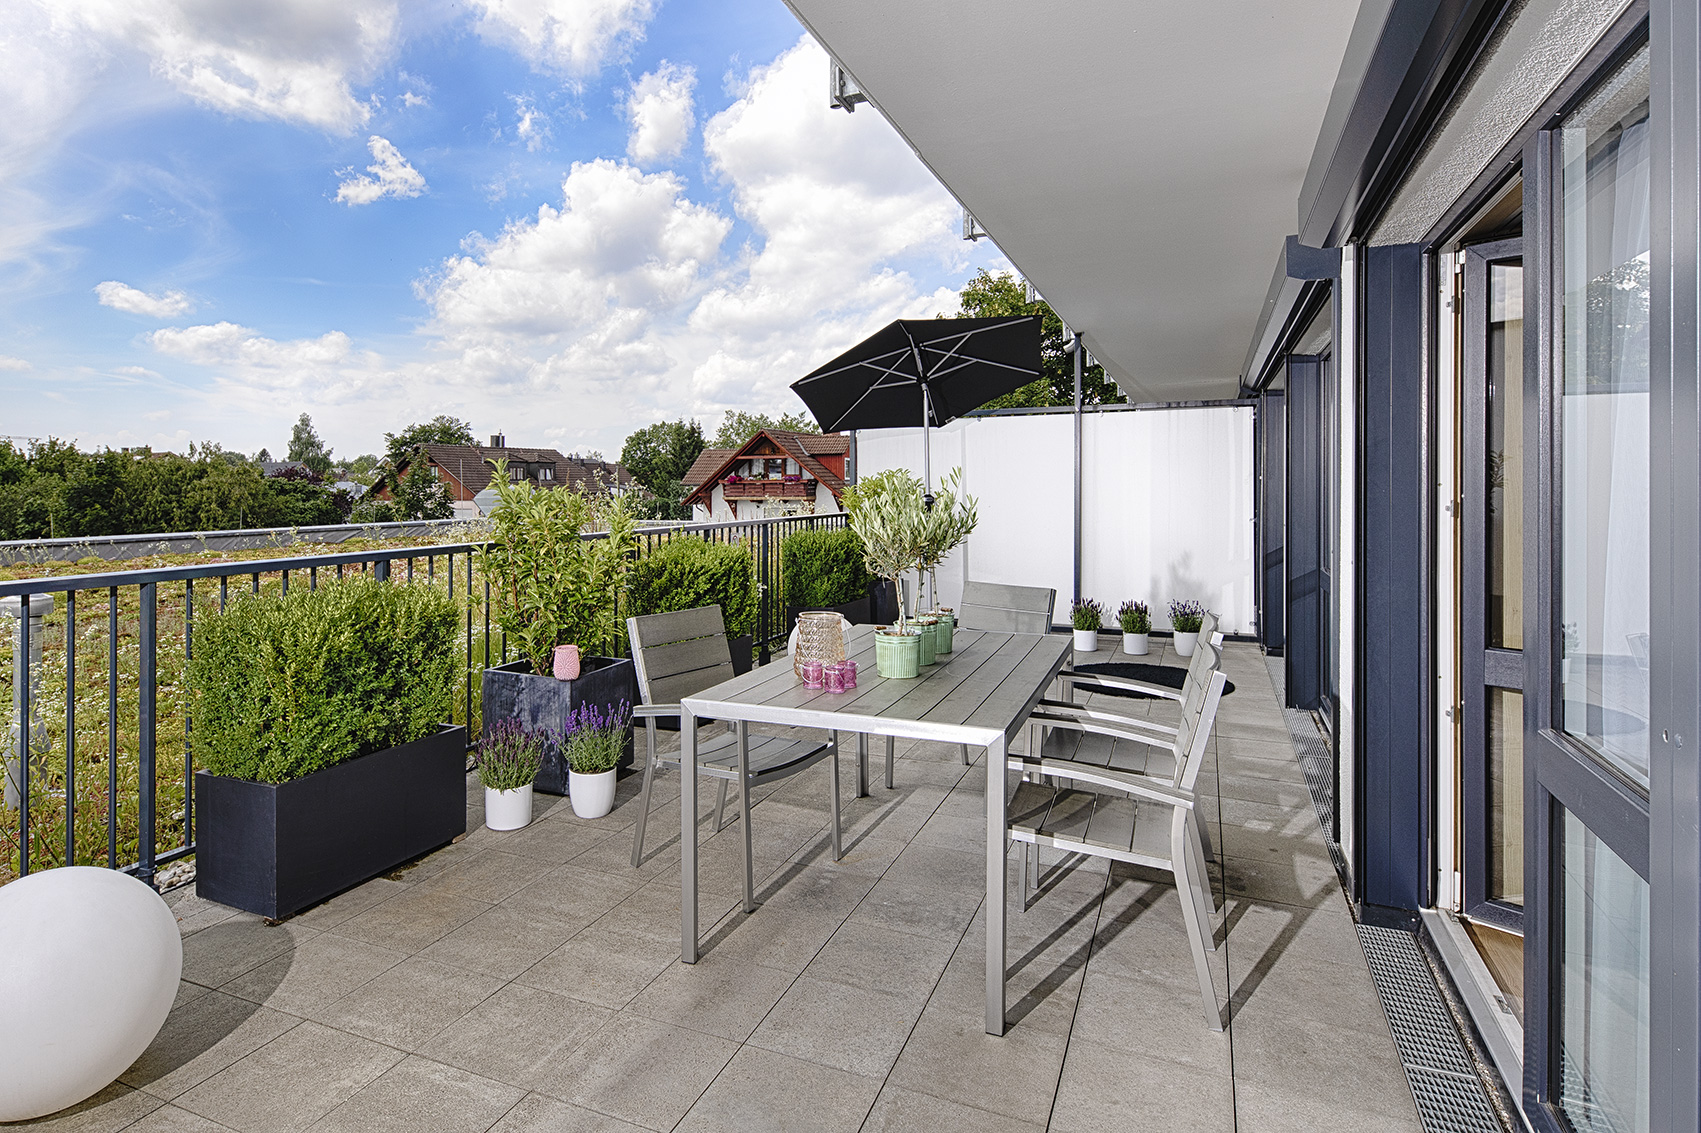 Terrace at MLoft Apartments, Trudering-Riem, Munich